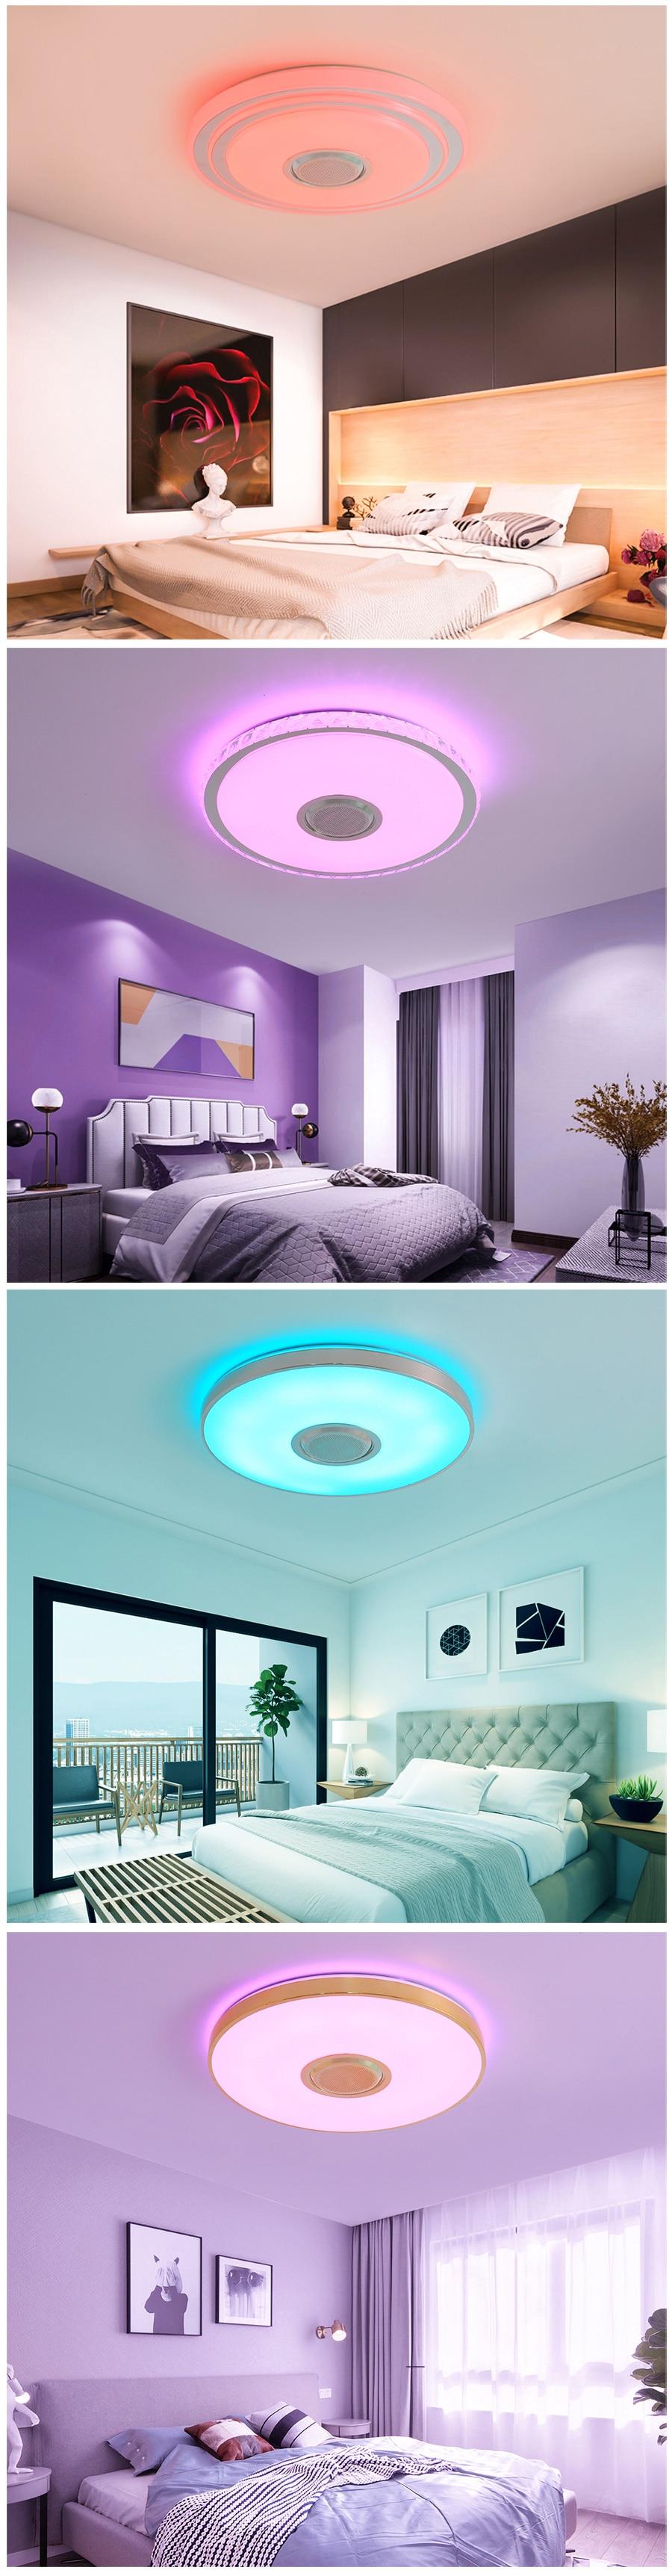 H2456e1cbee3642099a1161daca78ce185 Music LED ceiling Lights RGB APP and Remote control ceiling lamp bedroom 25W 36W 52W living room light lampara de techo